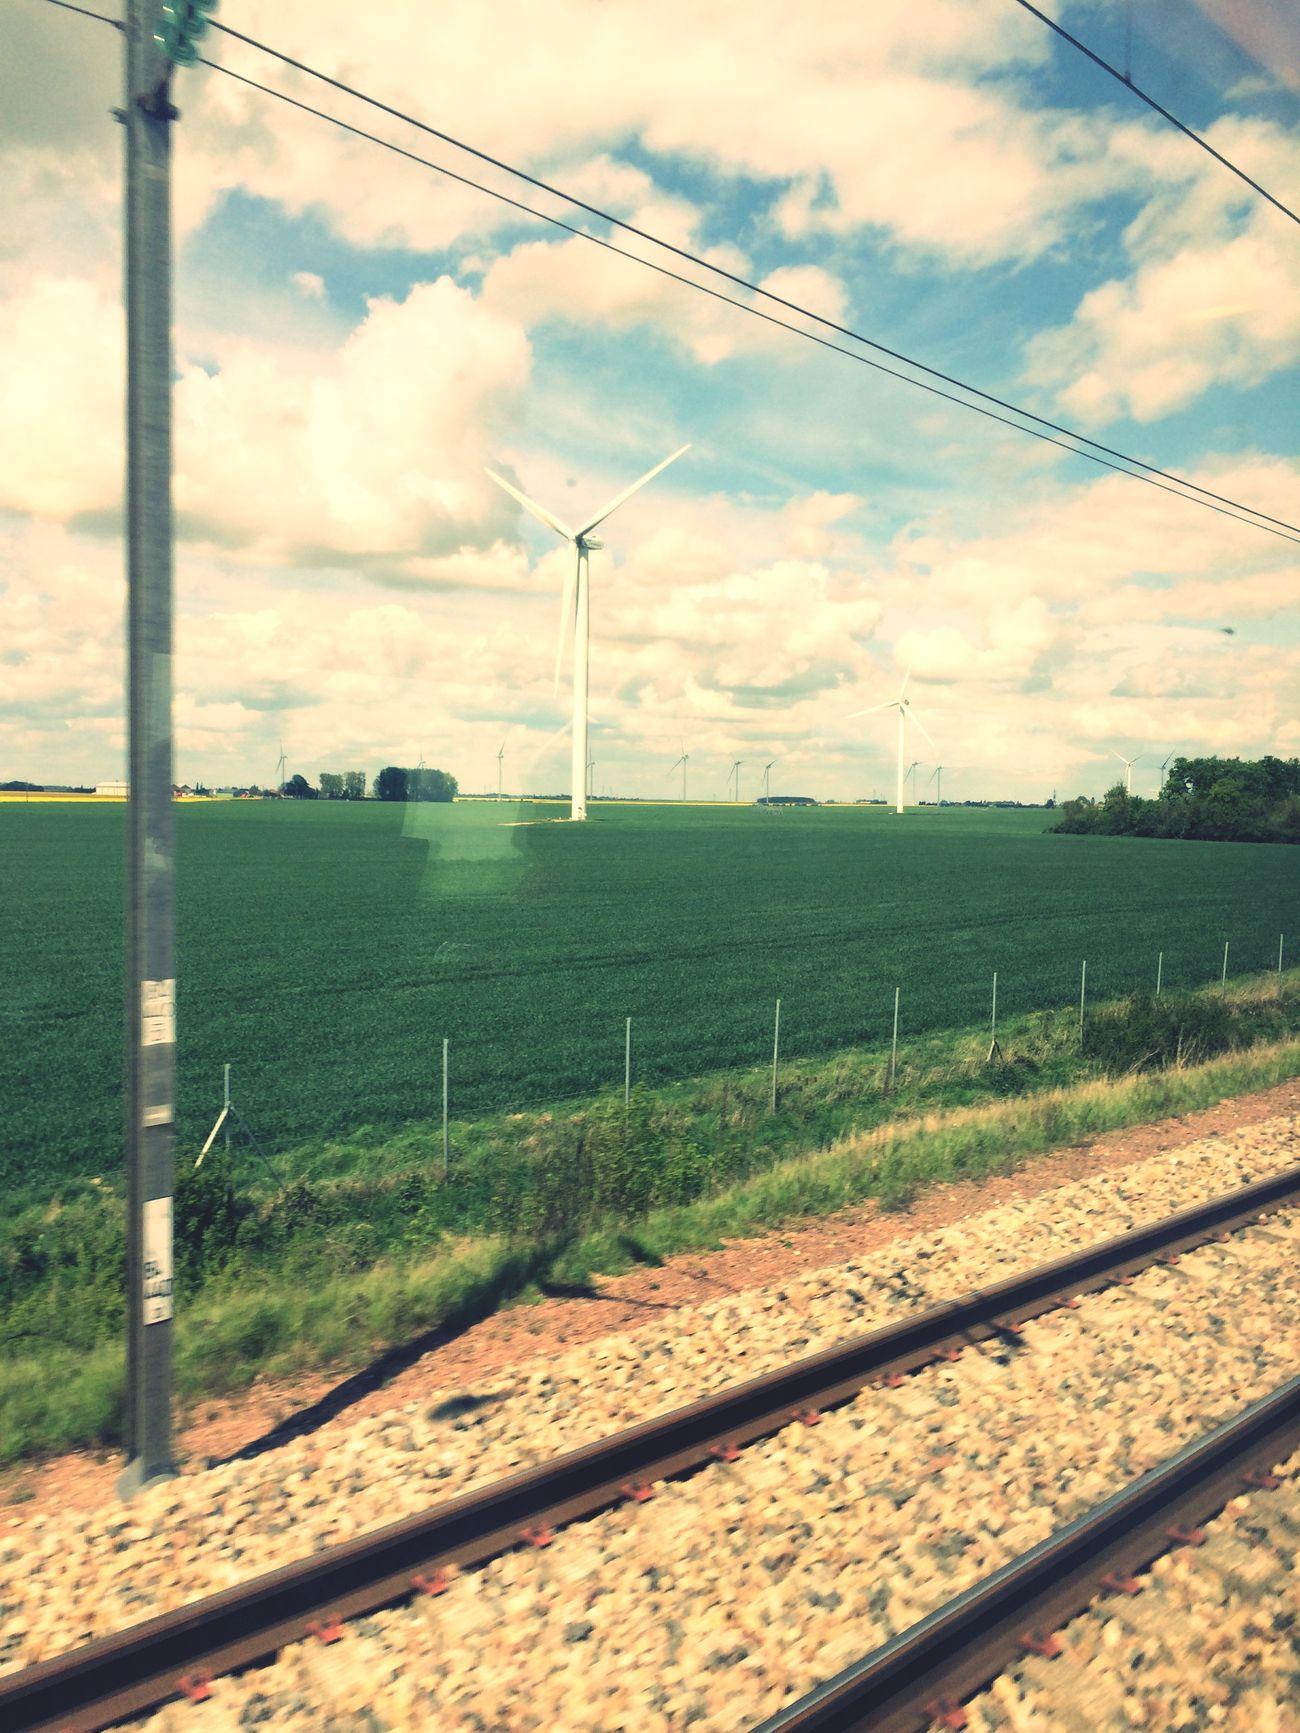 Travelling Sunny Day Eolienne Landscape Field